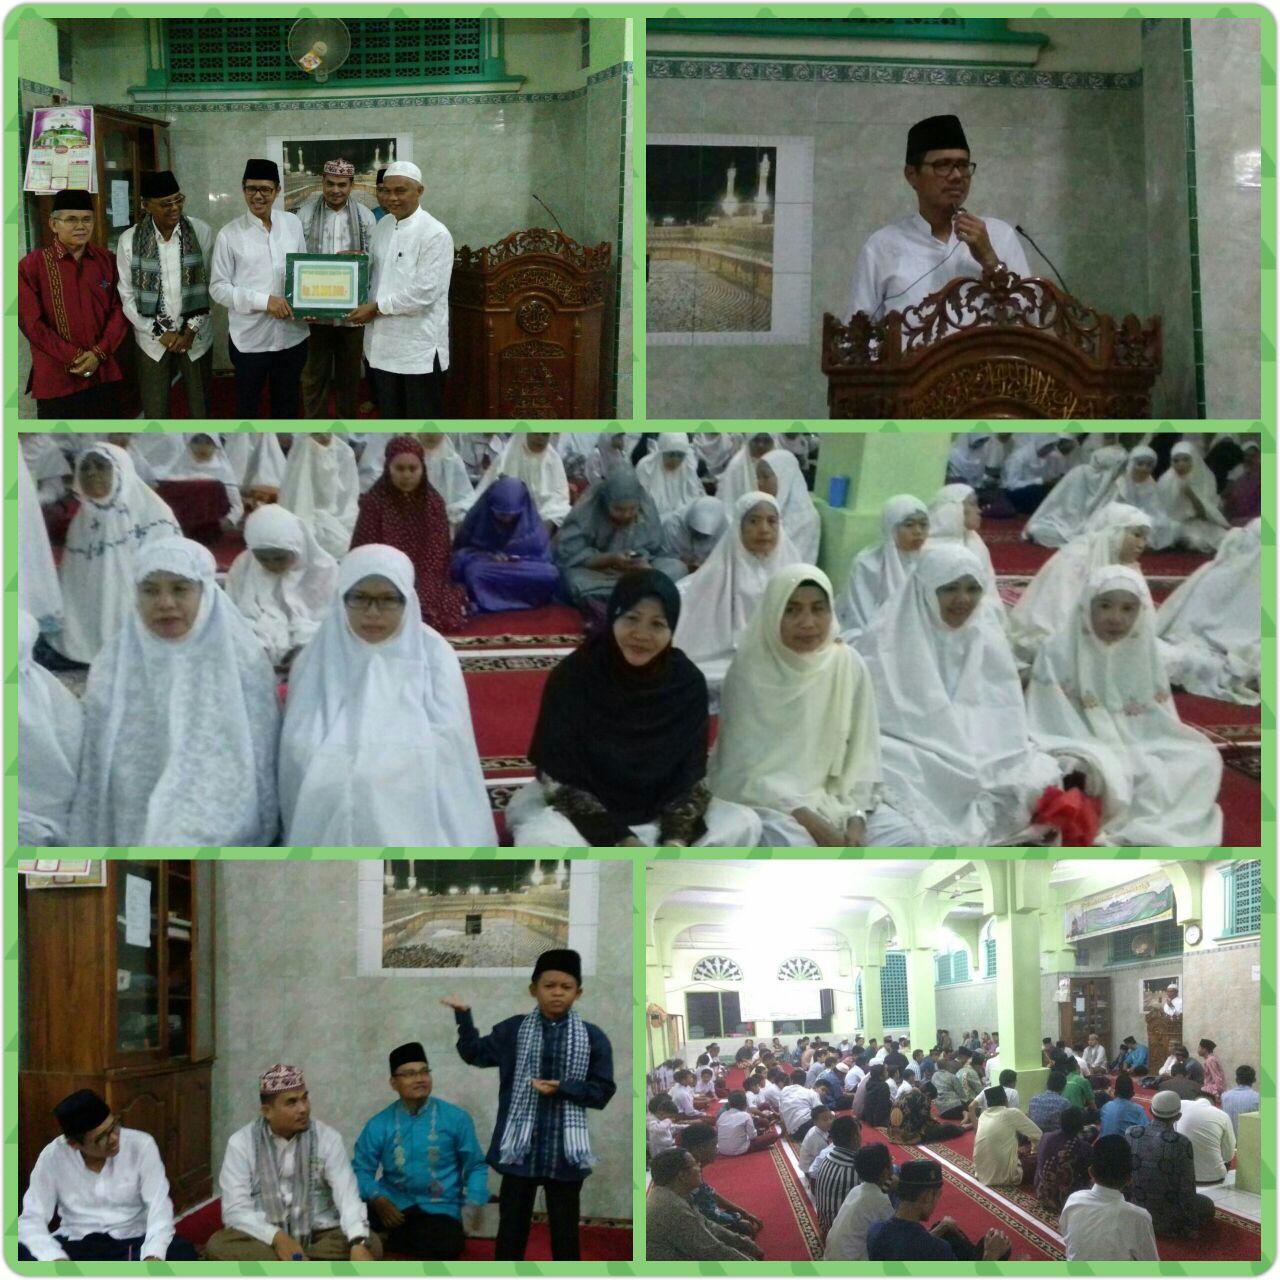 Tim Safari Ramadhan Provinsi Sumatera Barat sambangi Masjid Raya Baiturrahman, Lubuk Lintah